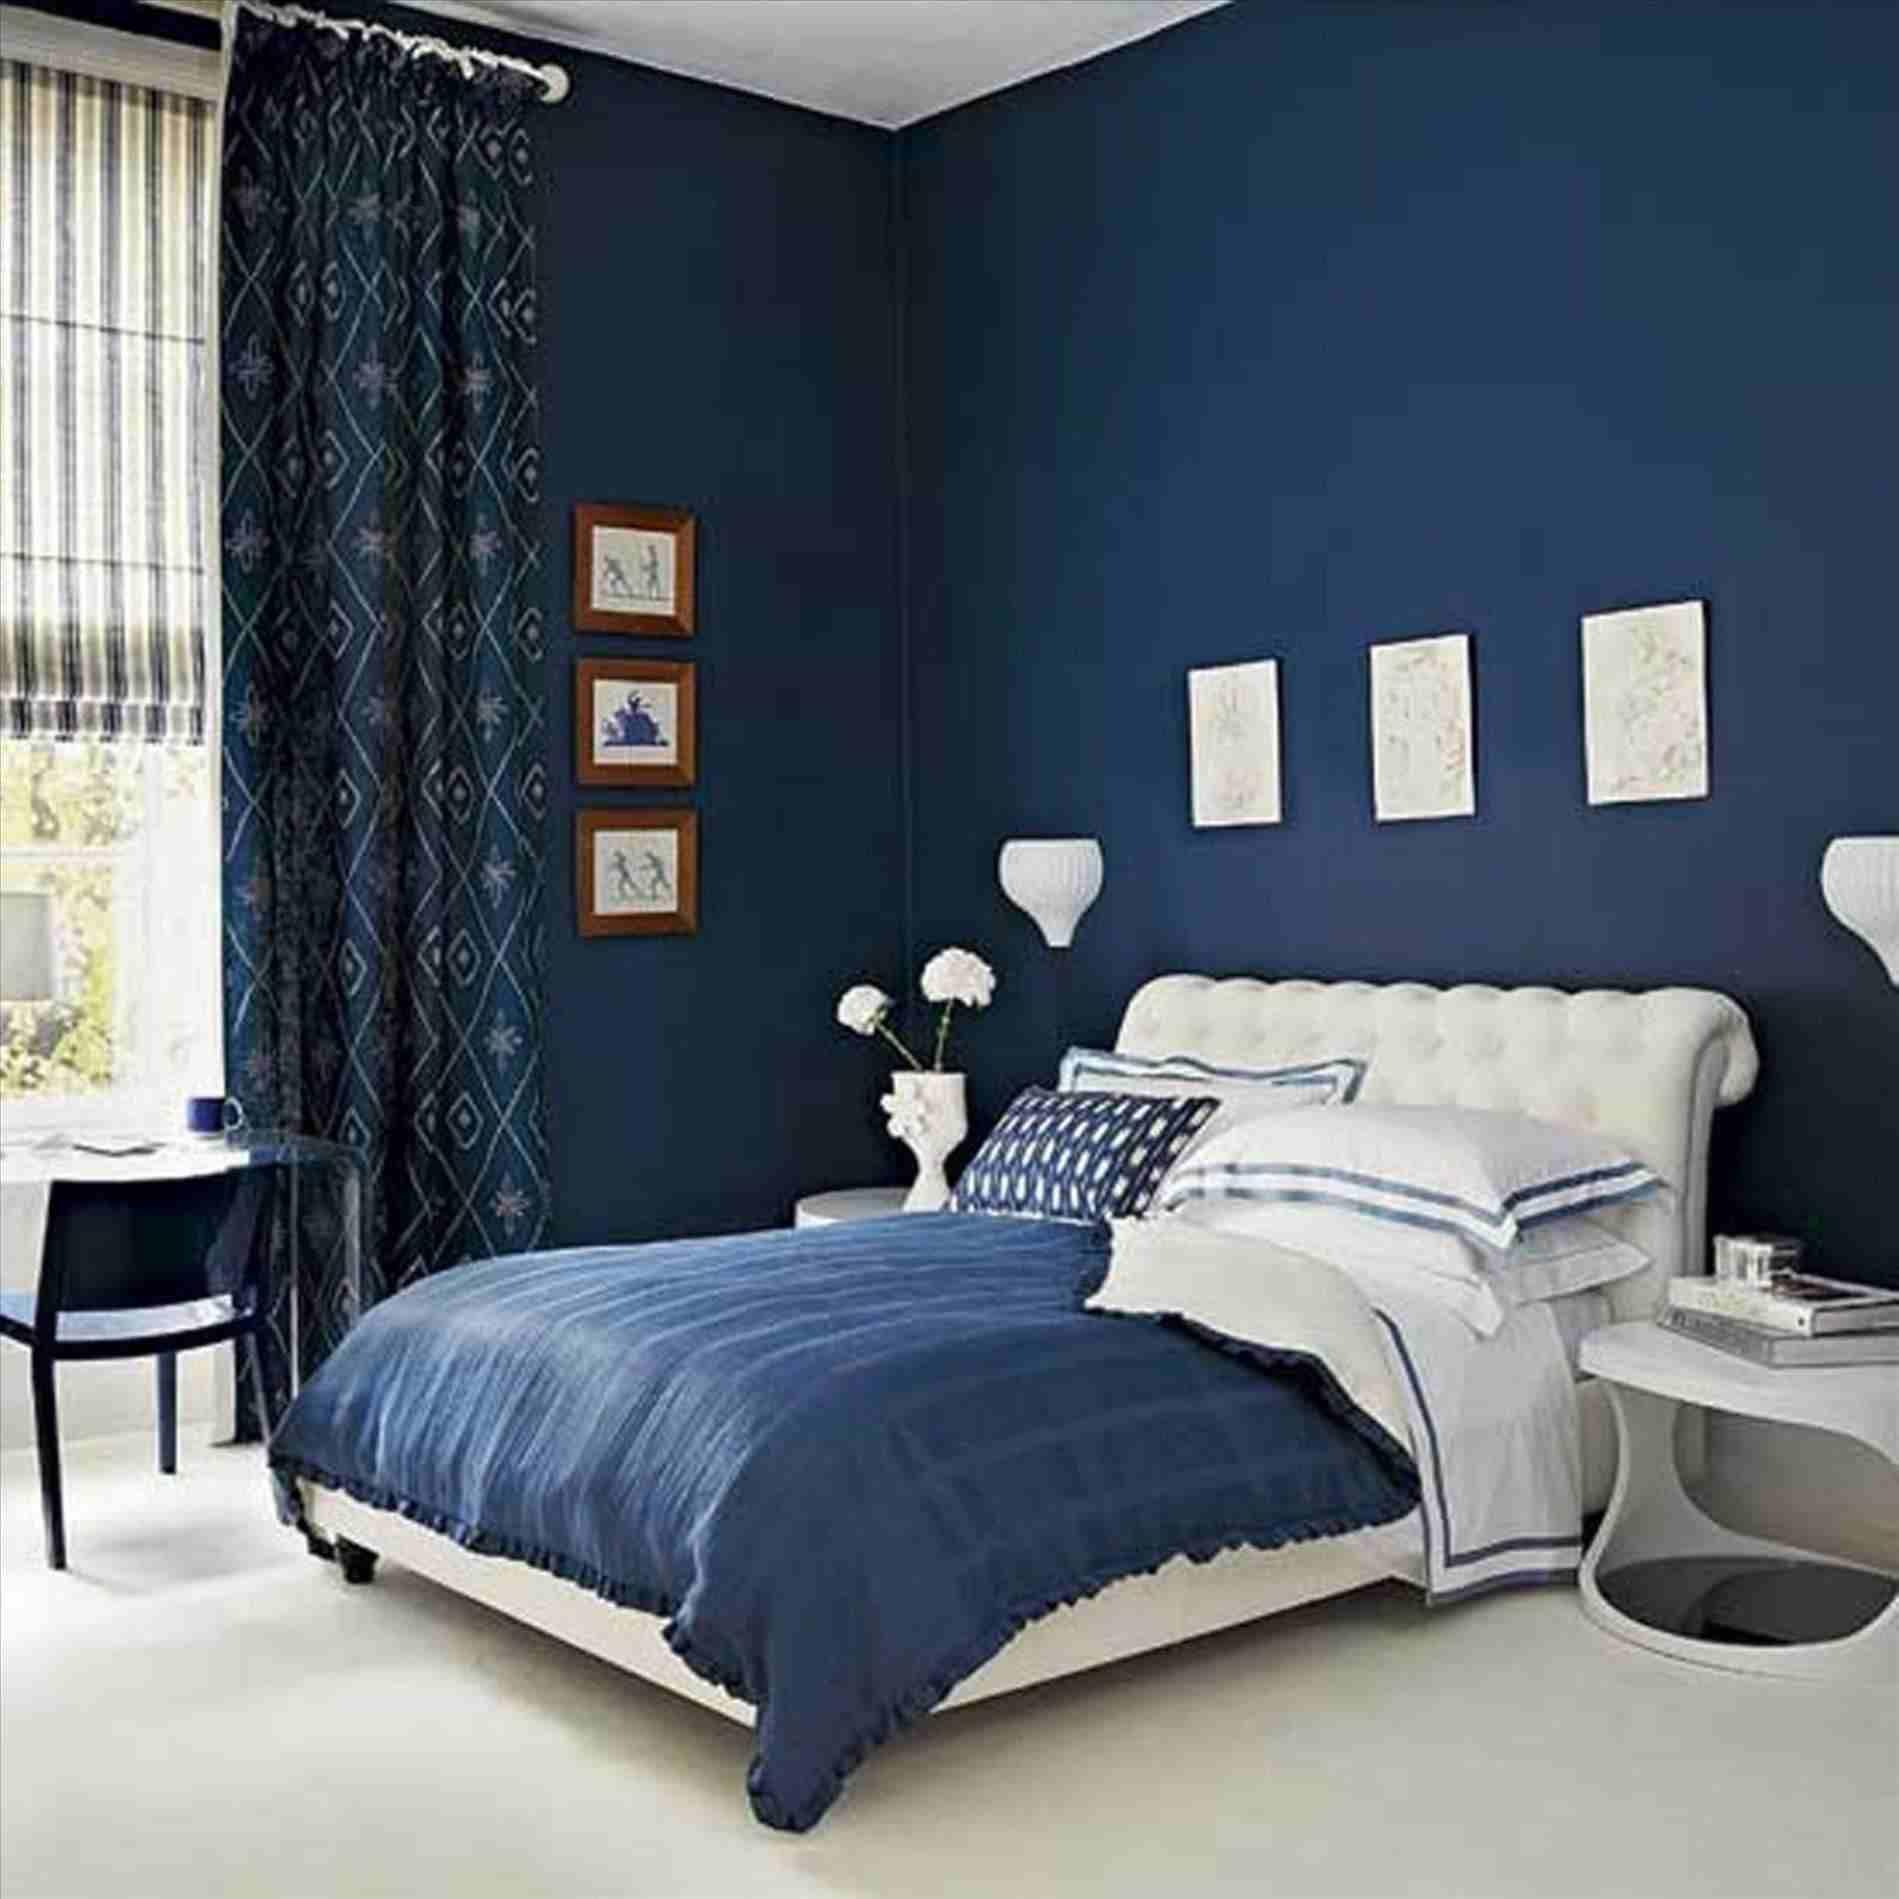 Bedroom Color Blue Blue Living Room Color Schemes Dark intended for proportions 1899 X 1899